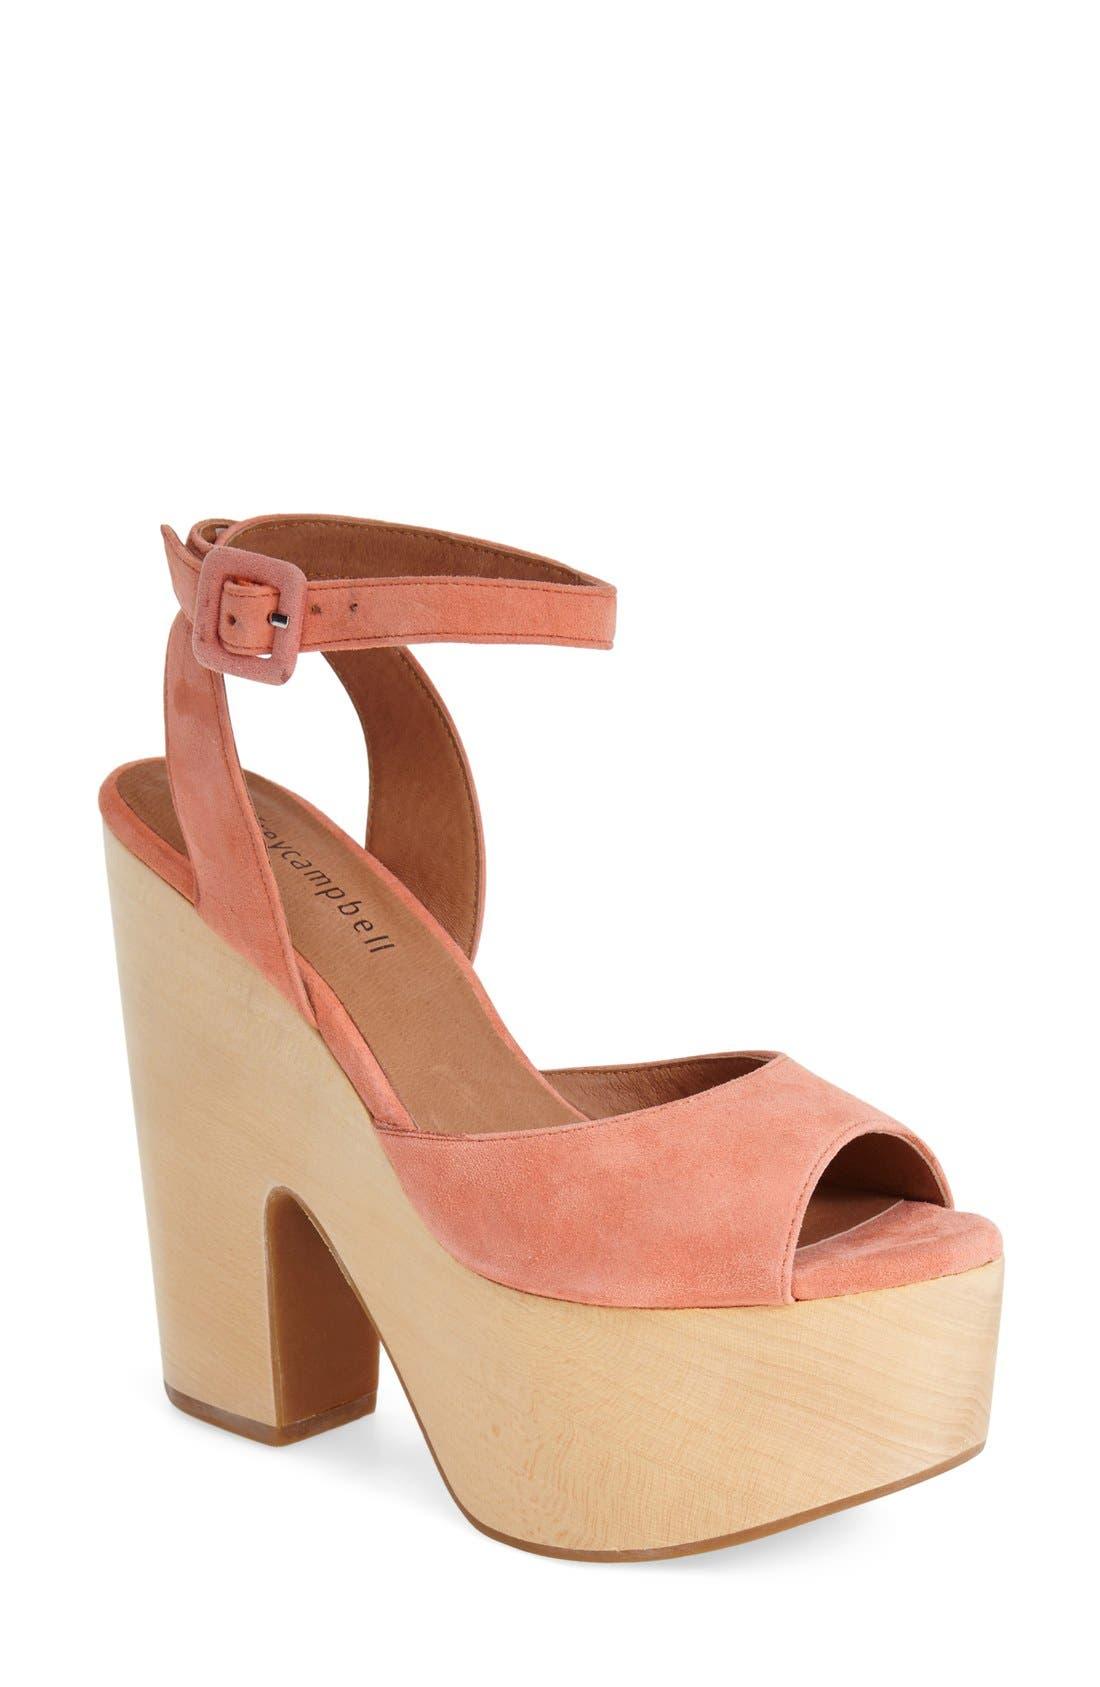 Main Image - Jeffrey Campbell 'Sassy' Wood Platform Sandal (Women)